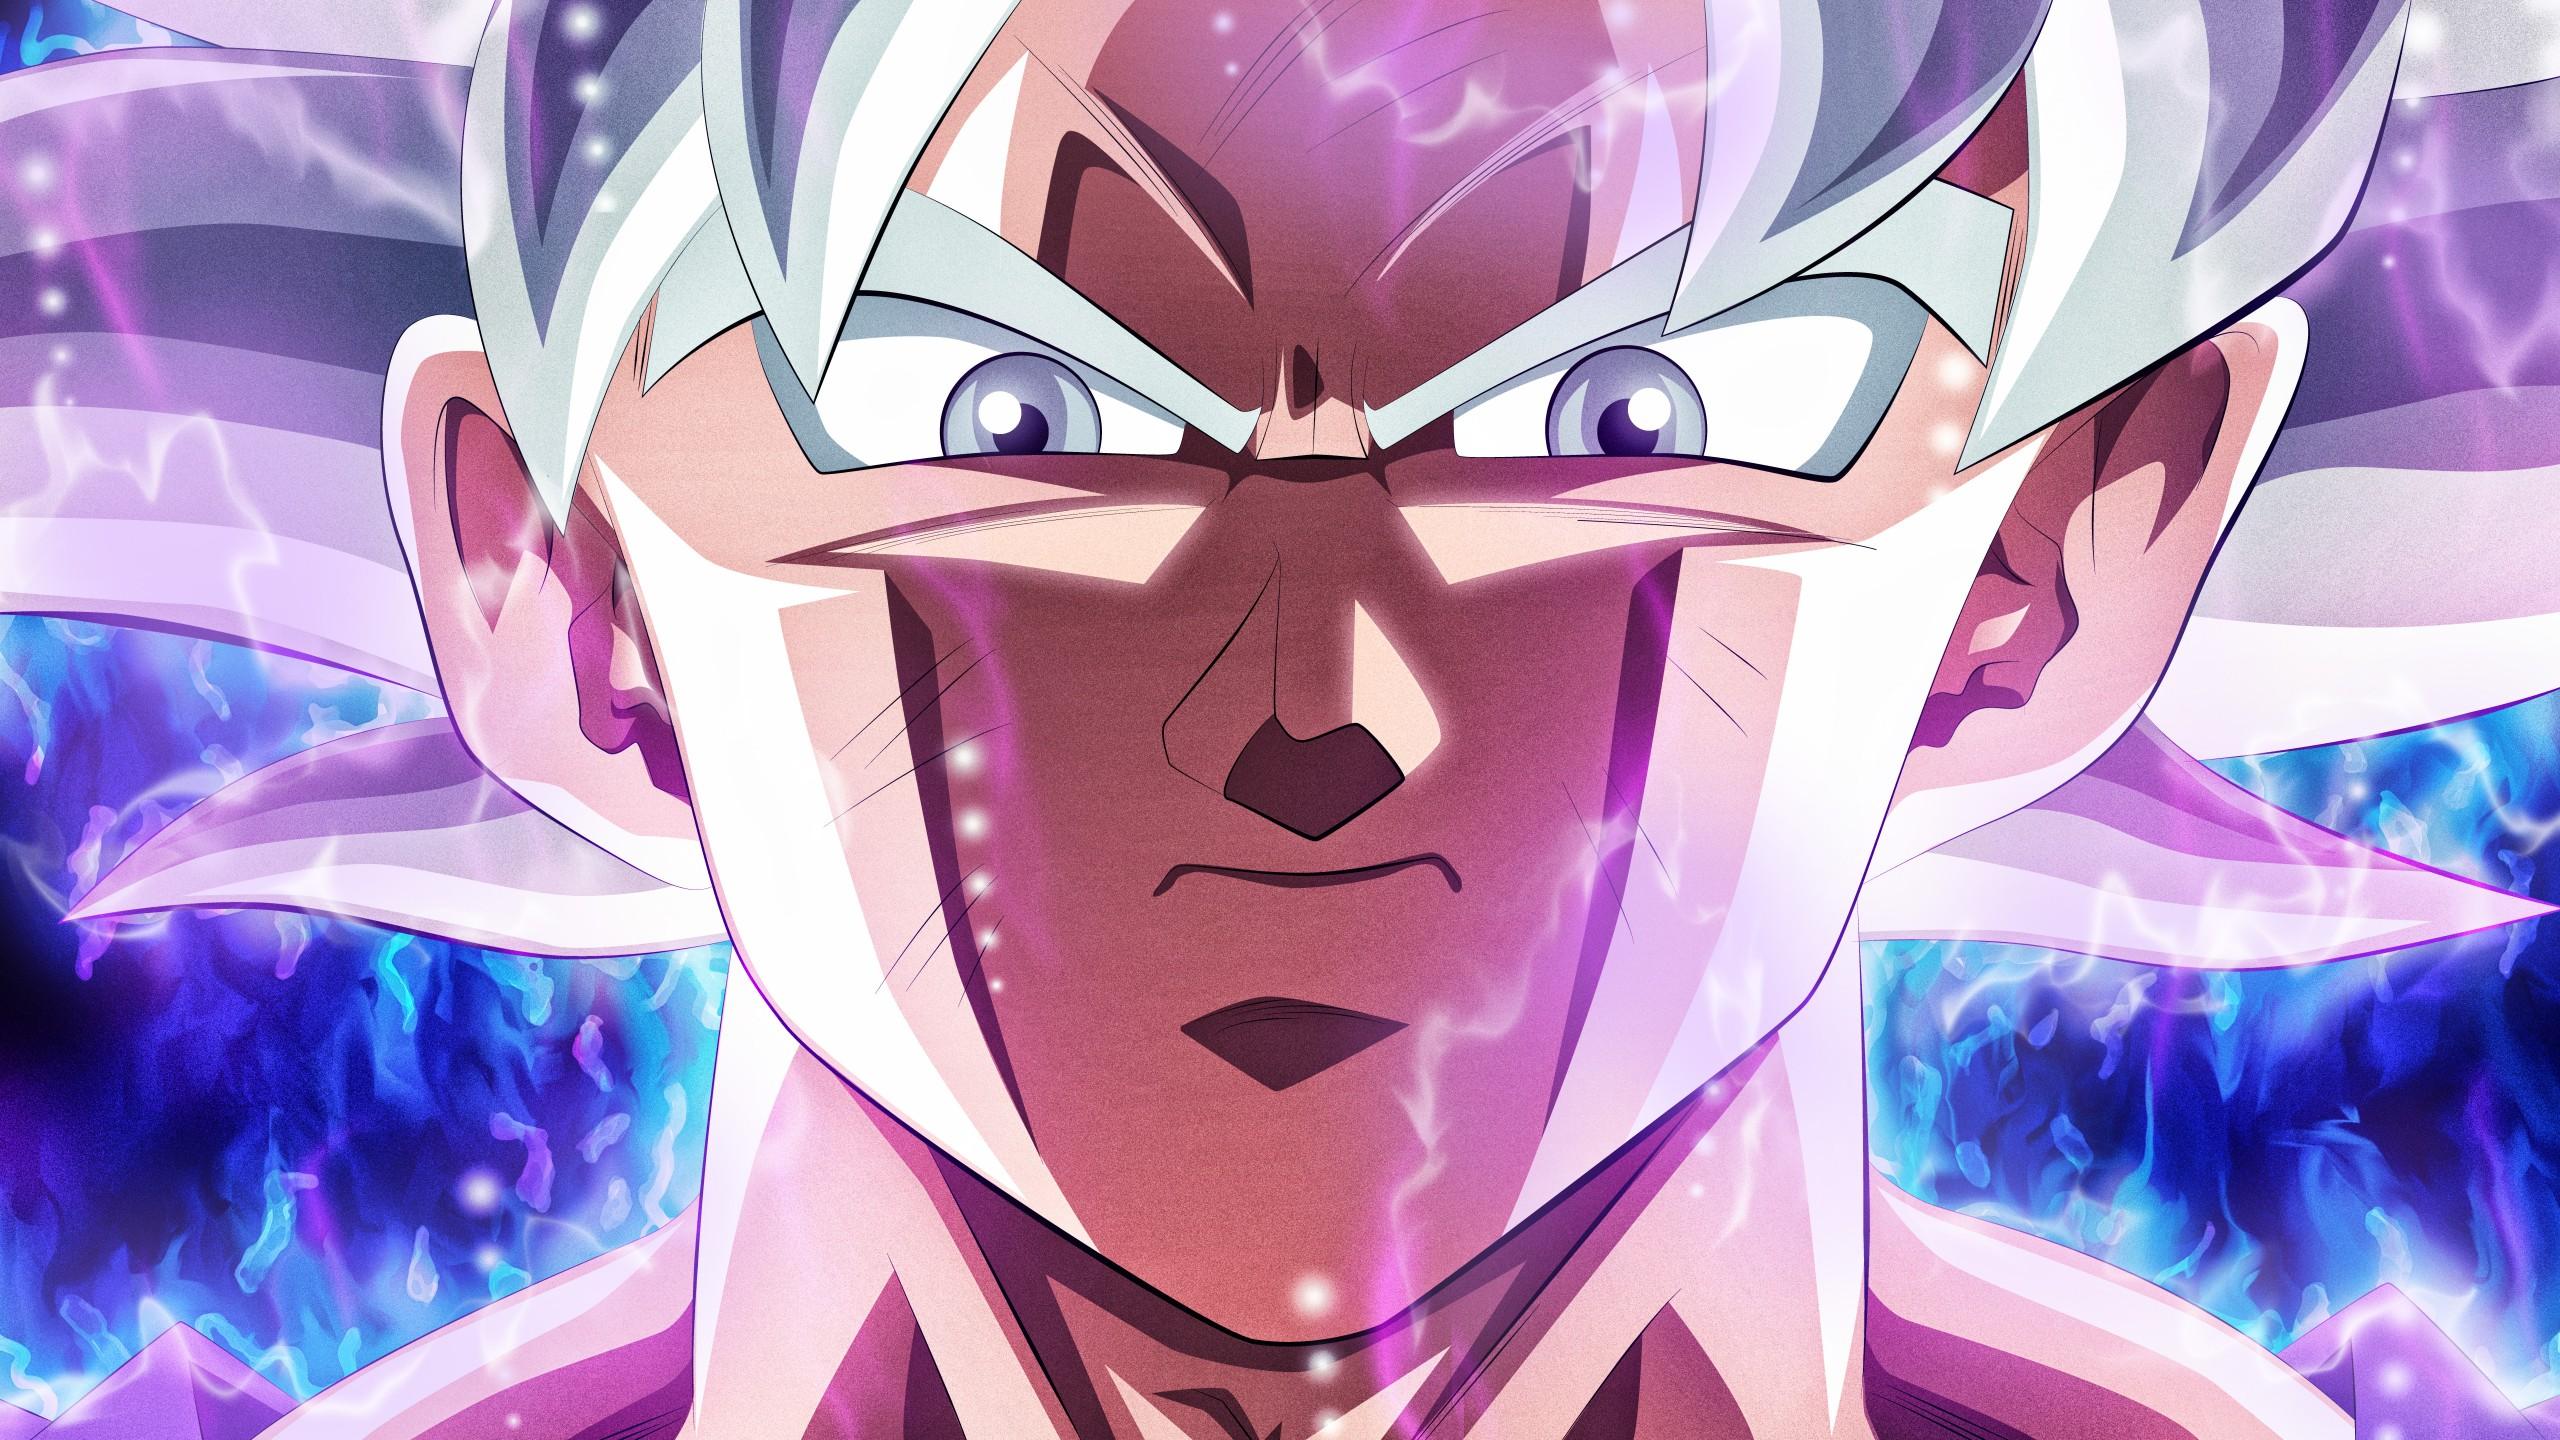 Goku Hd Wallpapers 1080p Goku Ultra Instinct 4k 8k Wallpapers Hd Wallpapers Id